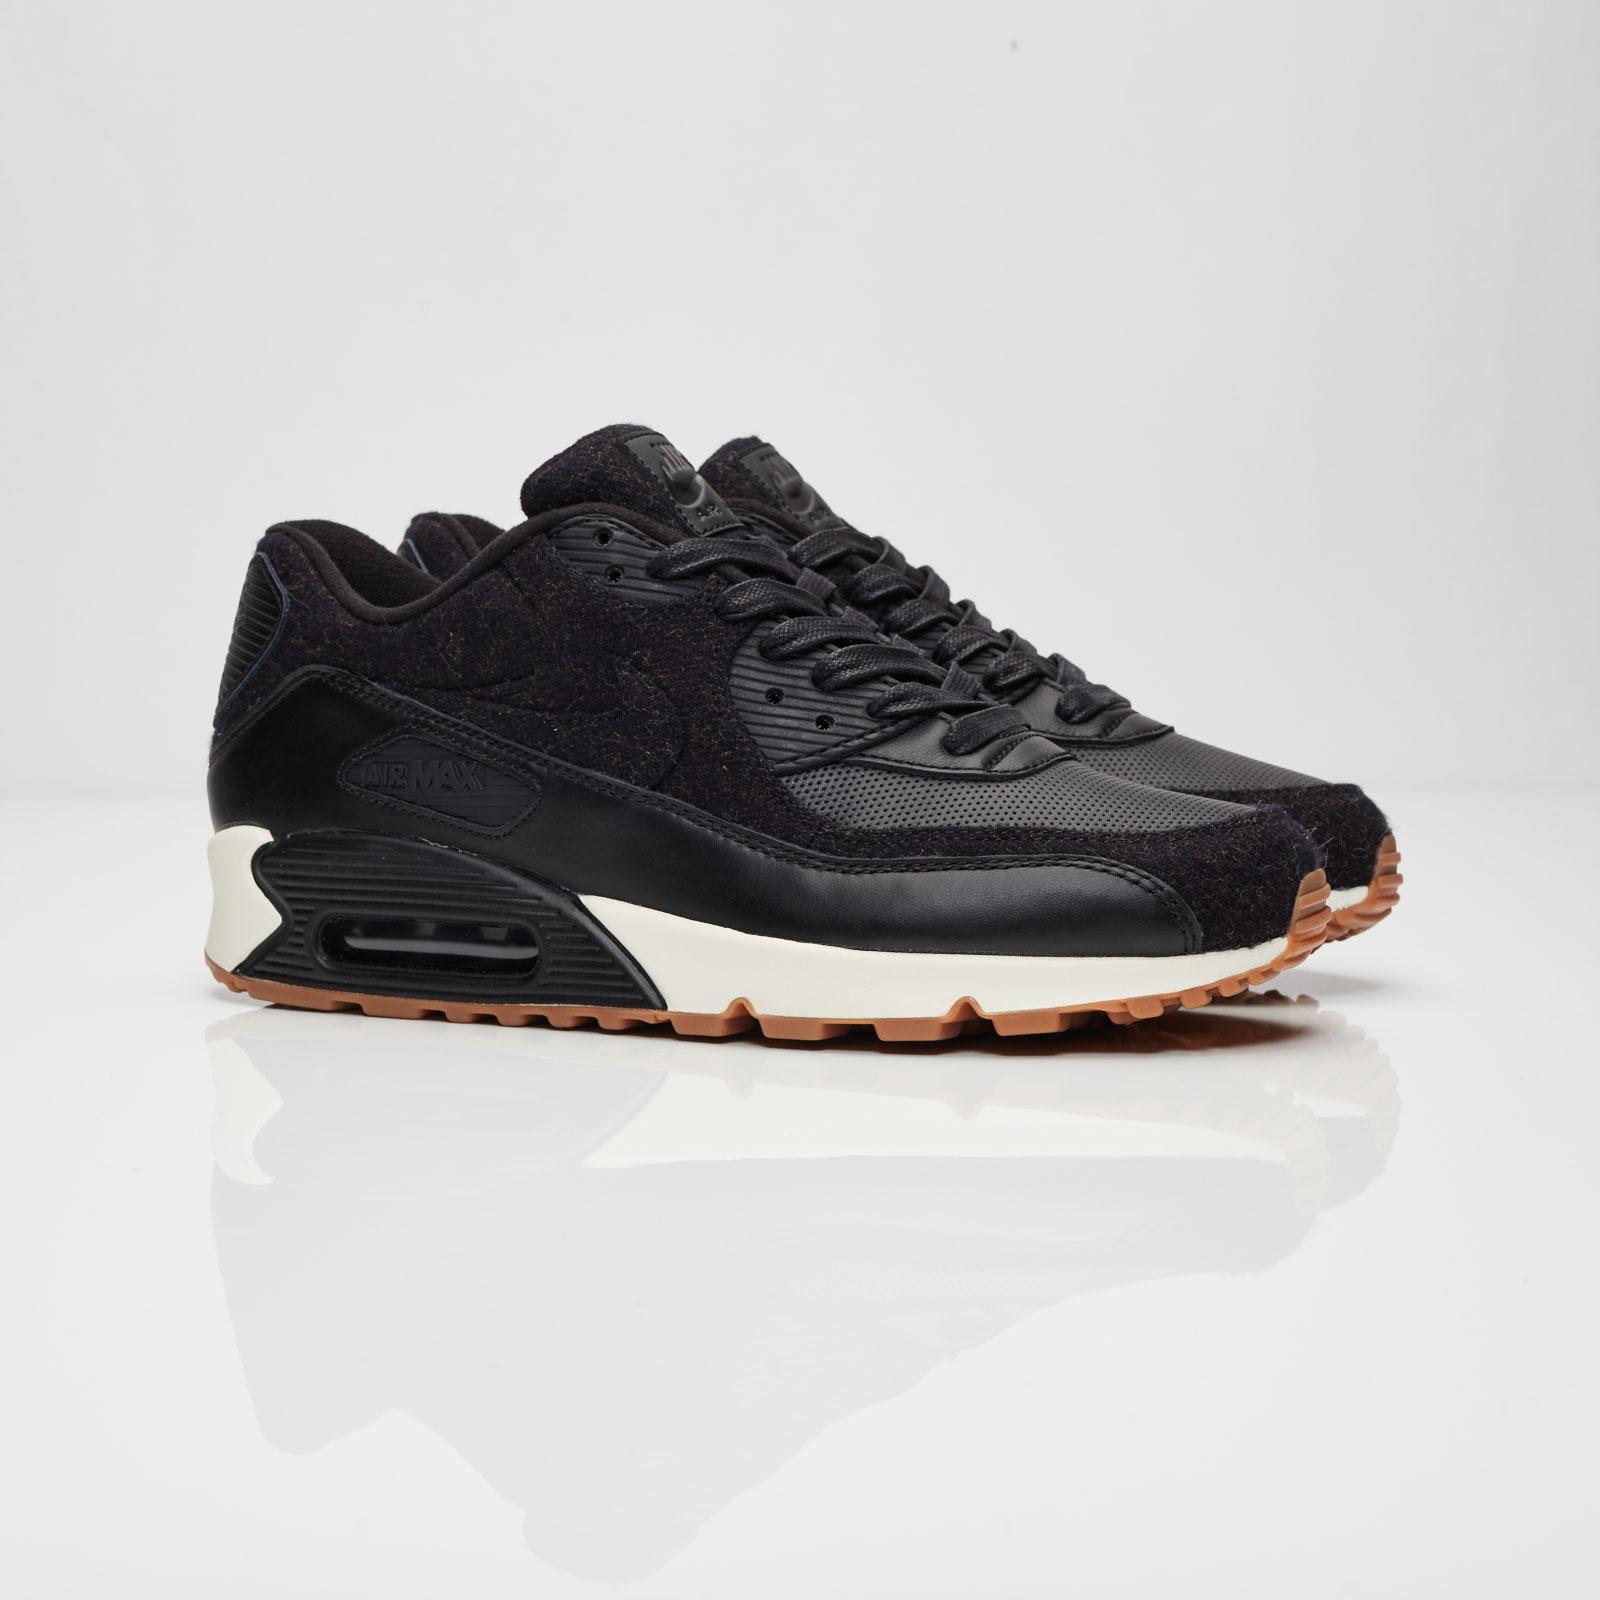 on sale dc9ea 38571 Nike Air Max 90 Premium